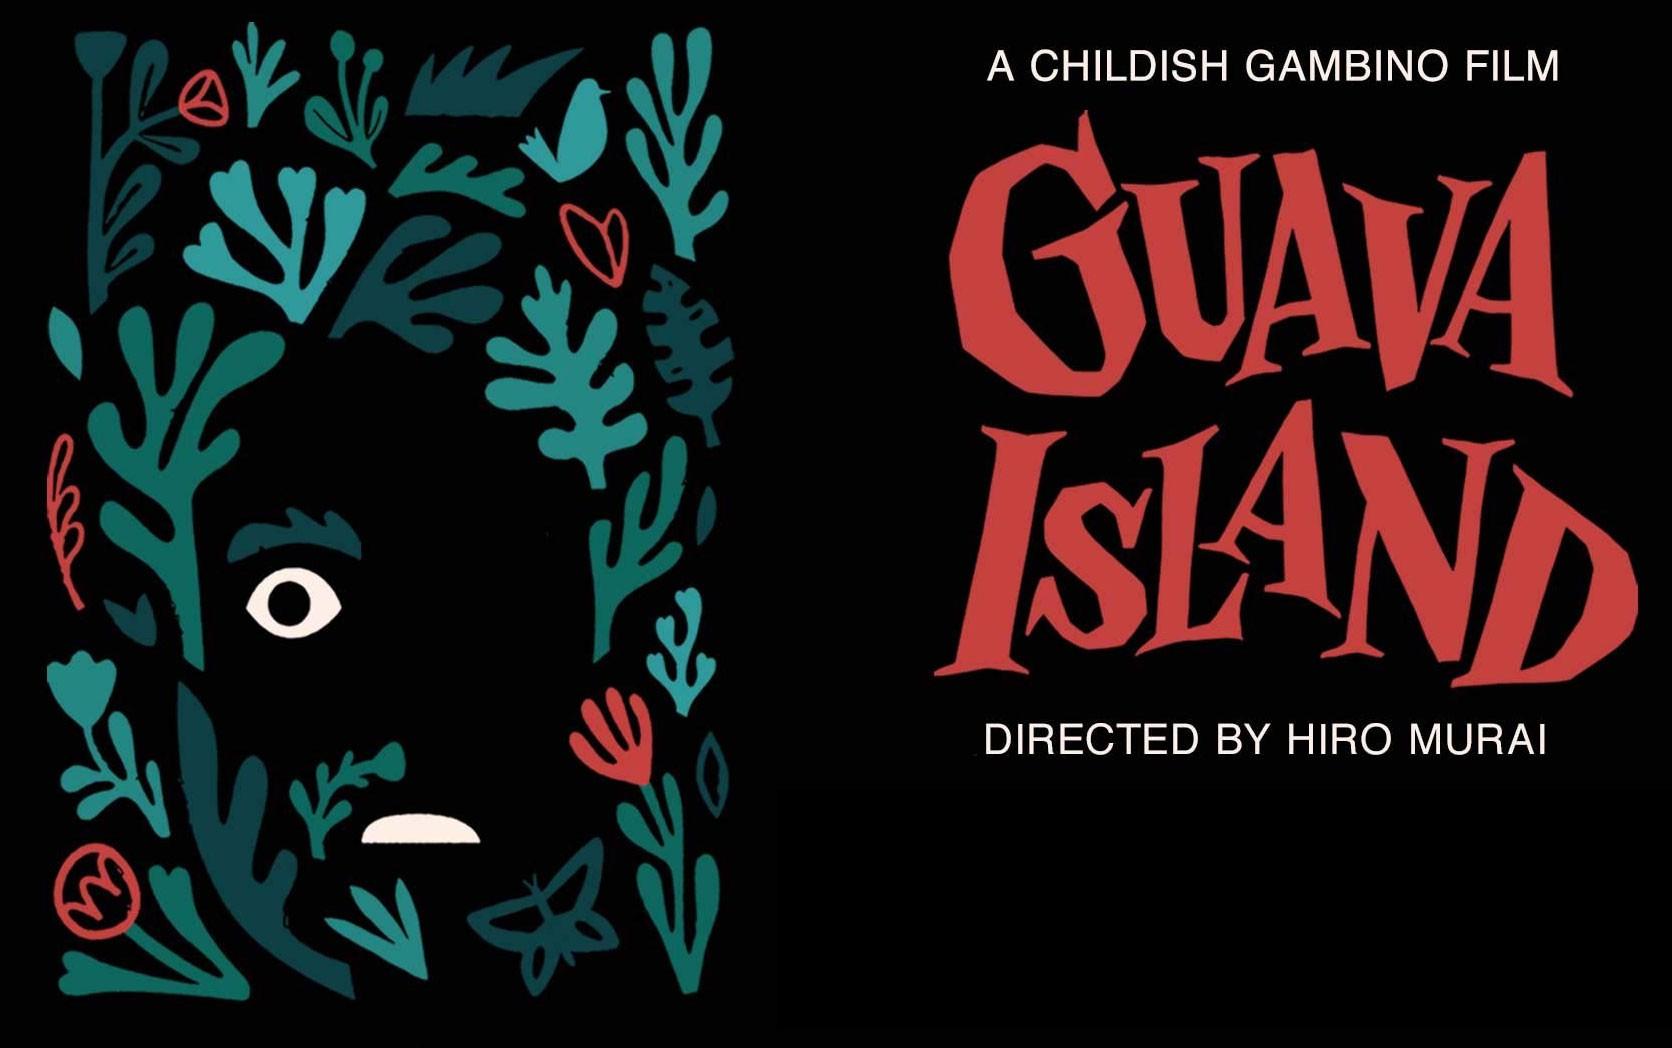 guava-island-childish-gambino-1554945554-compressed